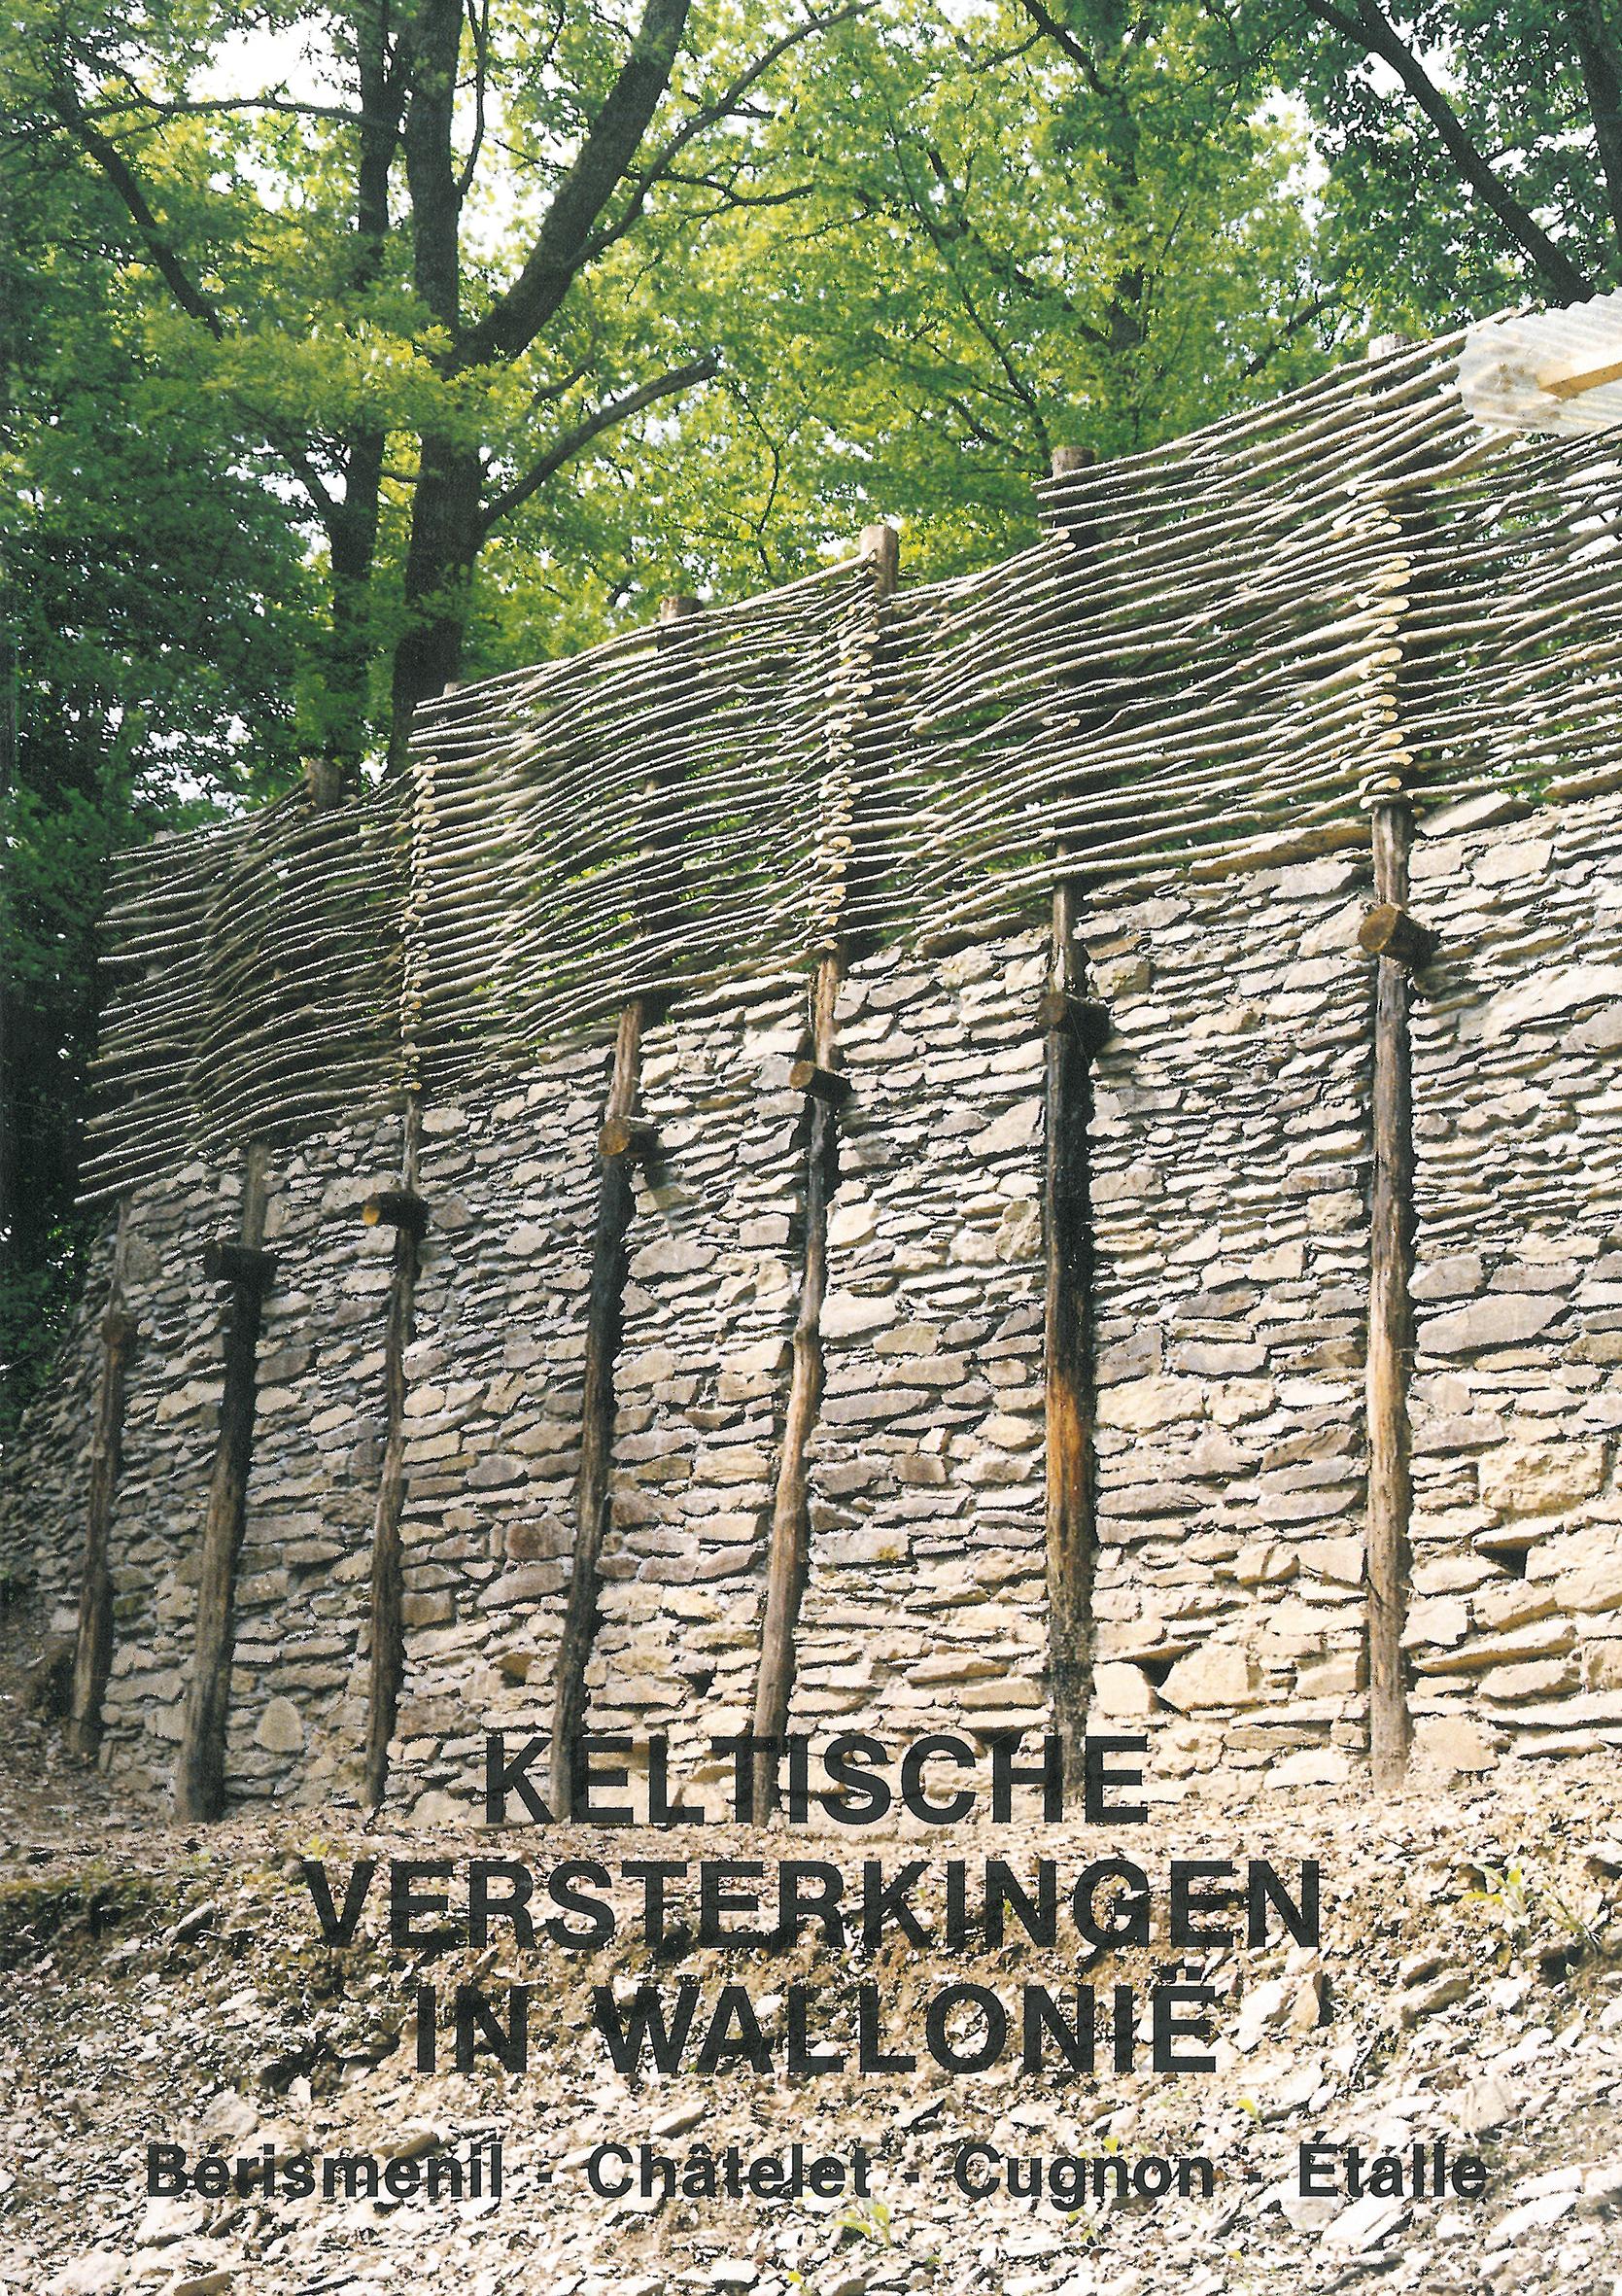 Keltische versterkingen in Wallonië – Bérismenil, Châtelet, Cugnon, Etalle